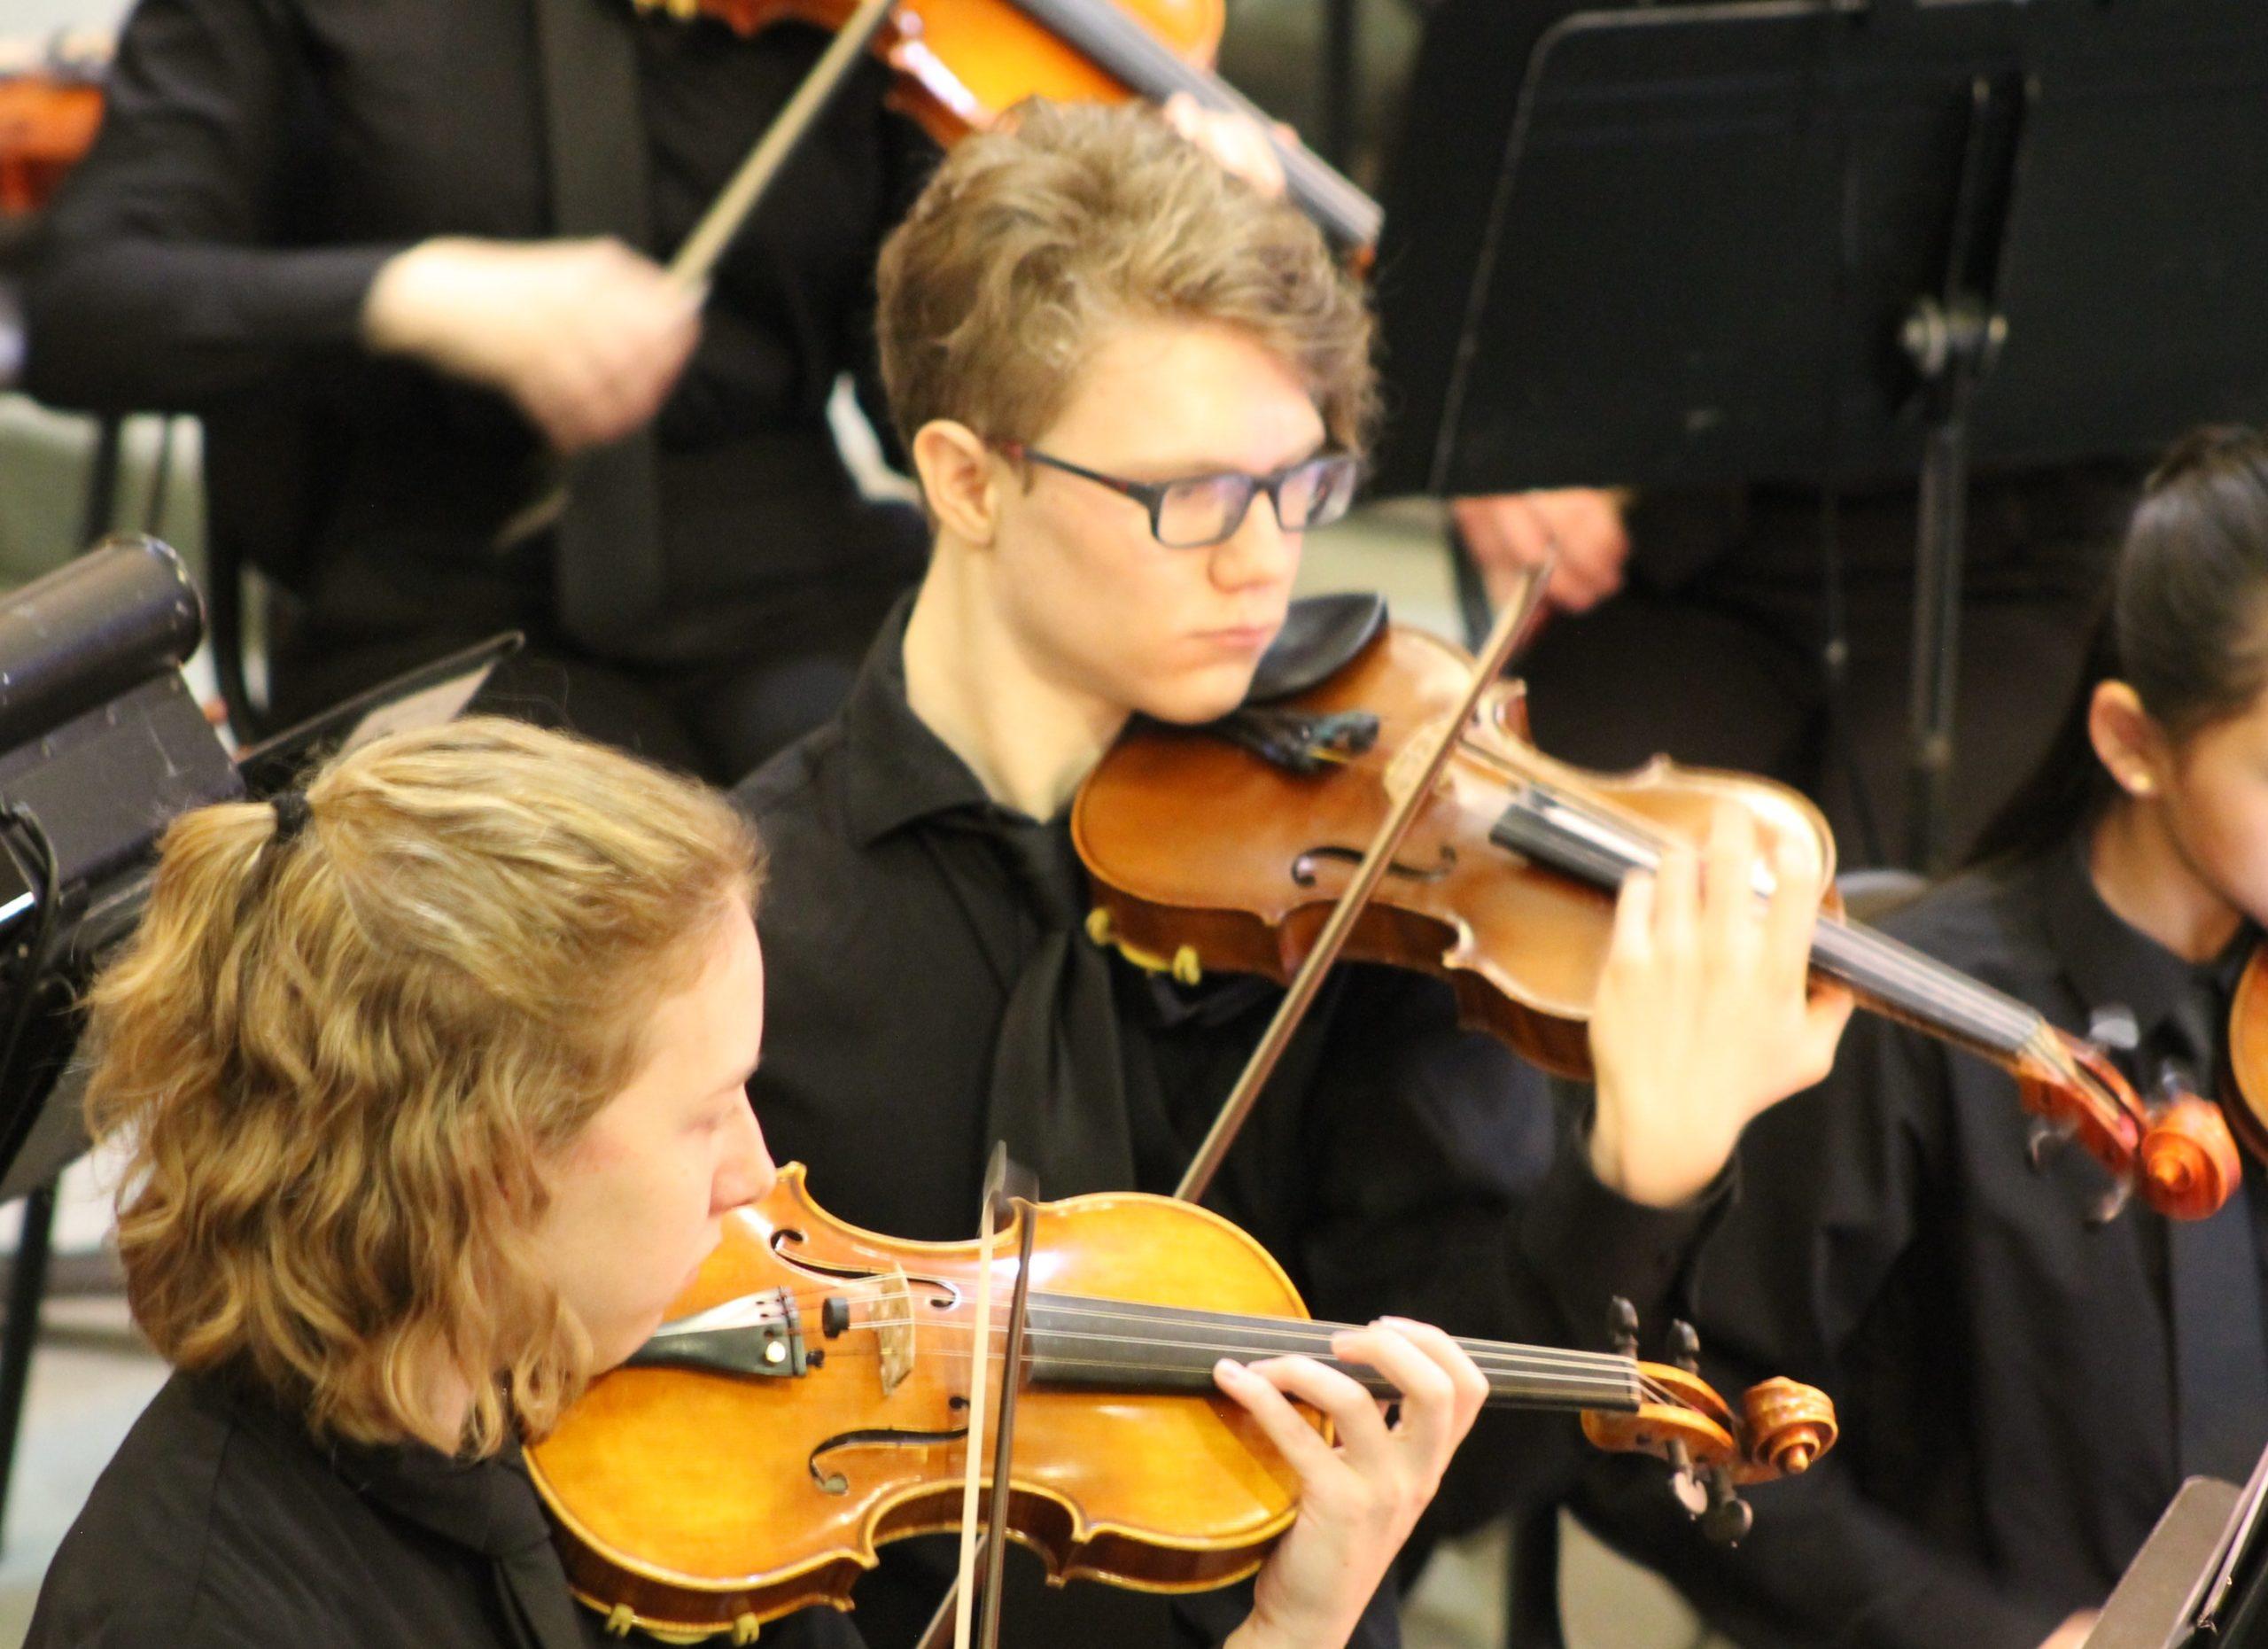 2019 holidays Lindsay violins 1 c